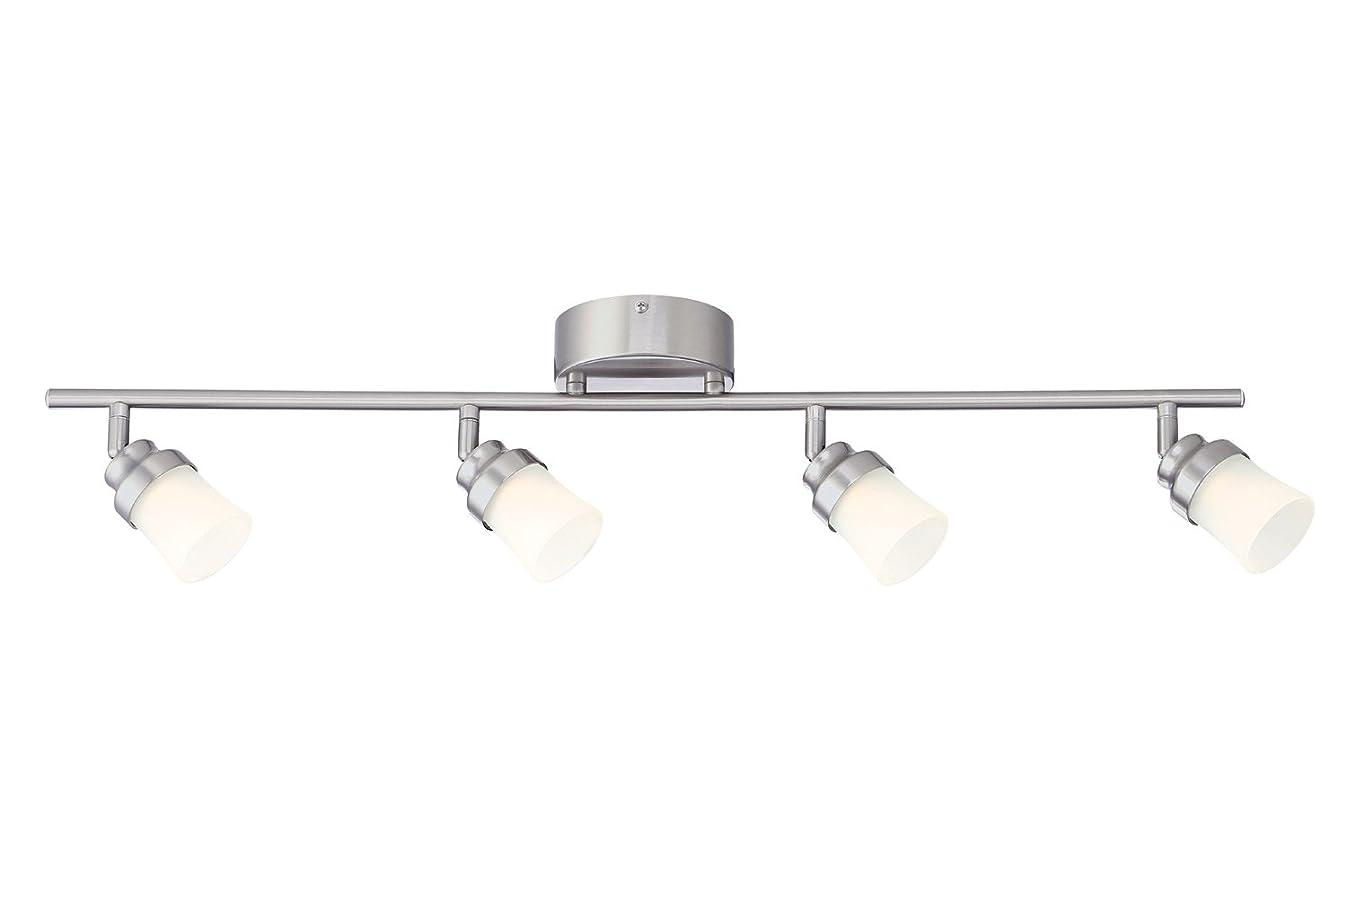 Designers Fountain EVT102027 Brushed Nickel LED Track Lighting Kit with 4 LED Track Lights, 1890 Lumens, 3 ft